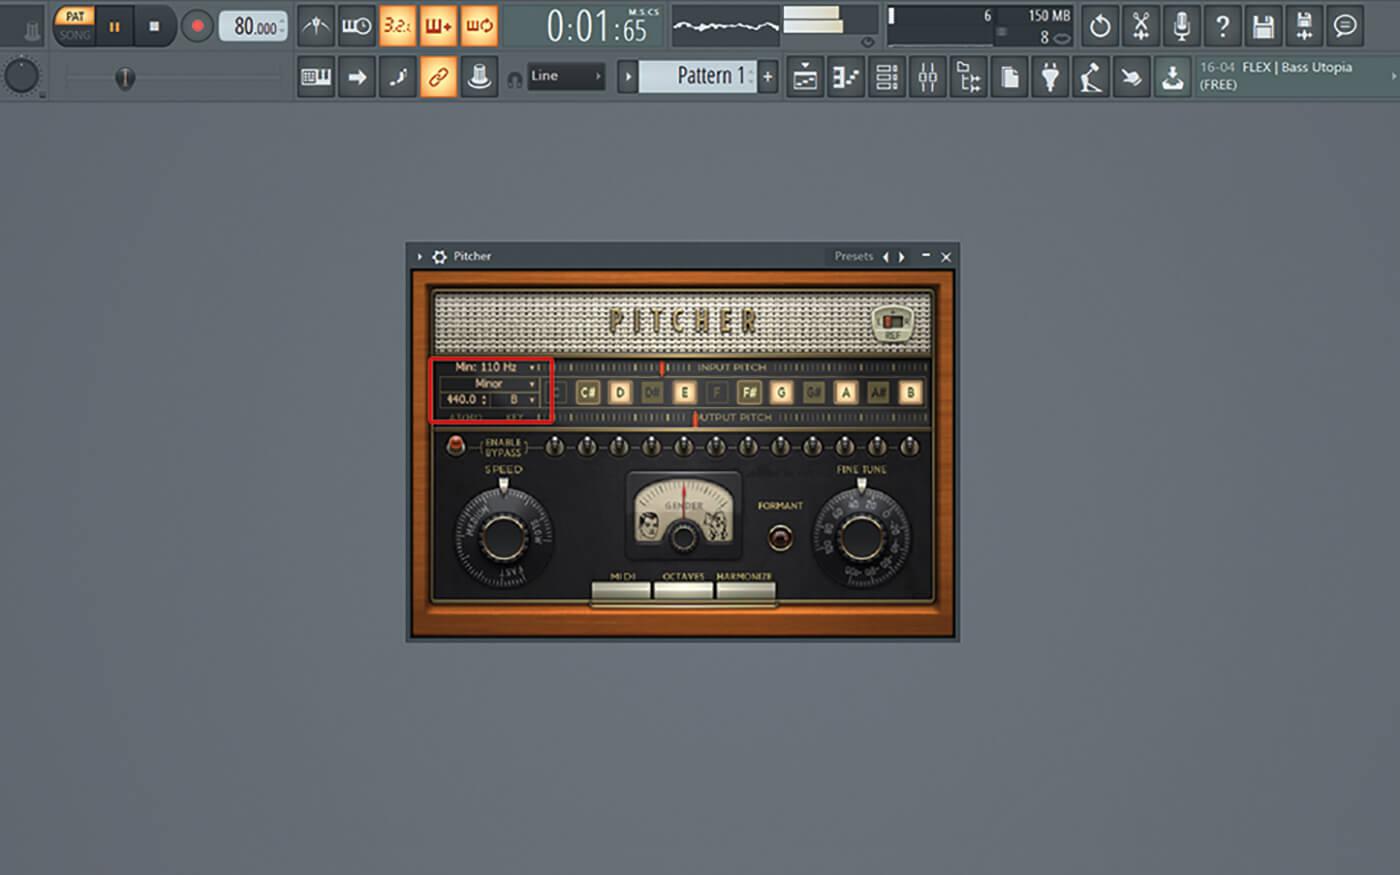 MT208 FLT Studio Lo-Fi Beats TUT 16